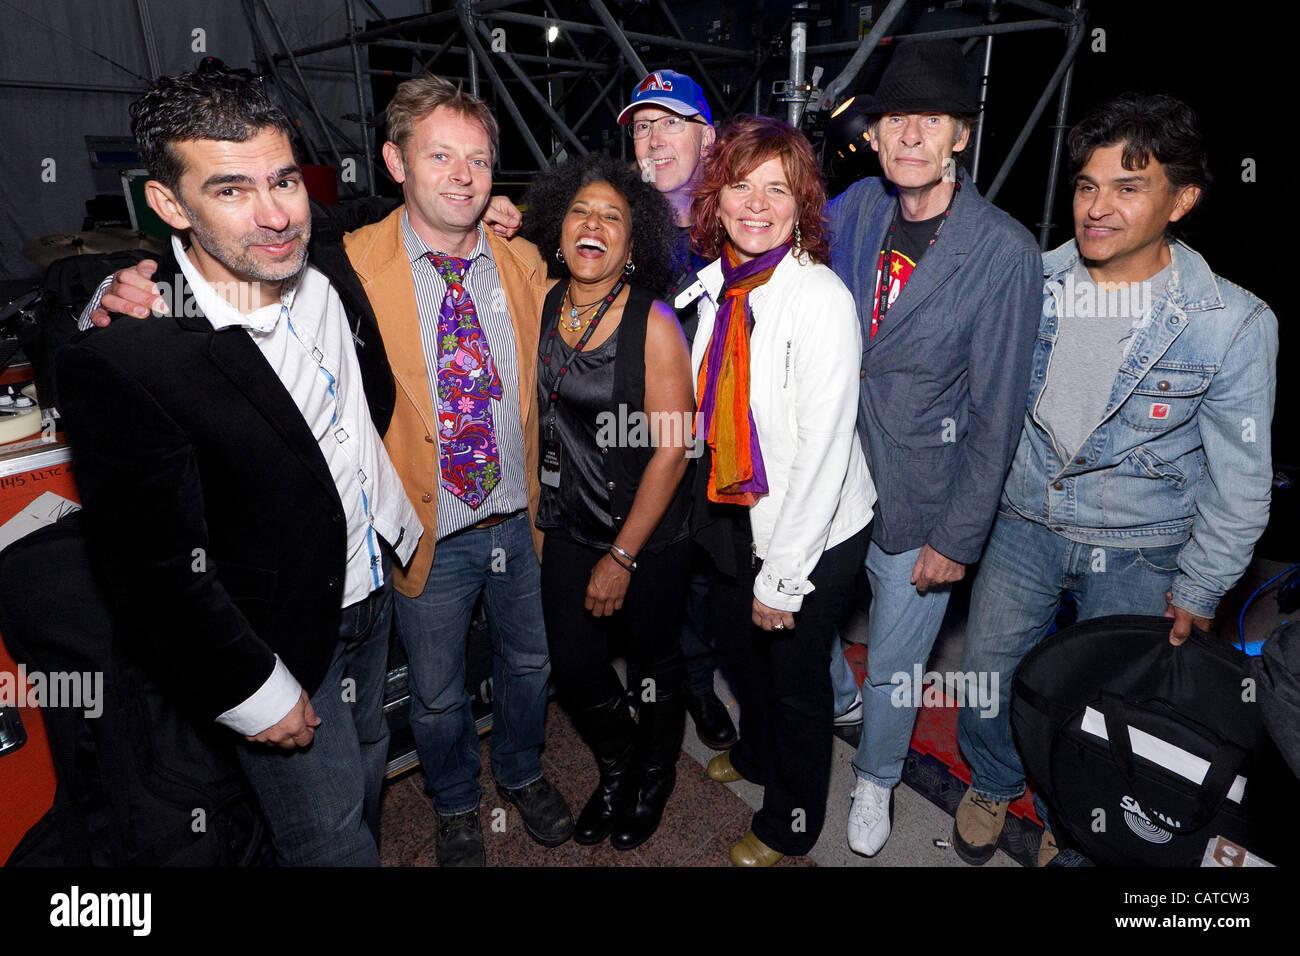 April 19, 2012 - Toronto, Cana...